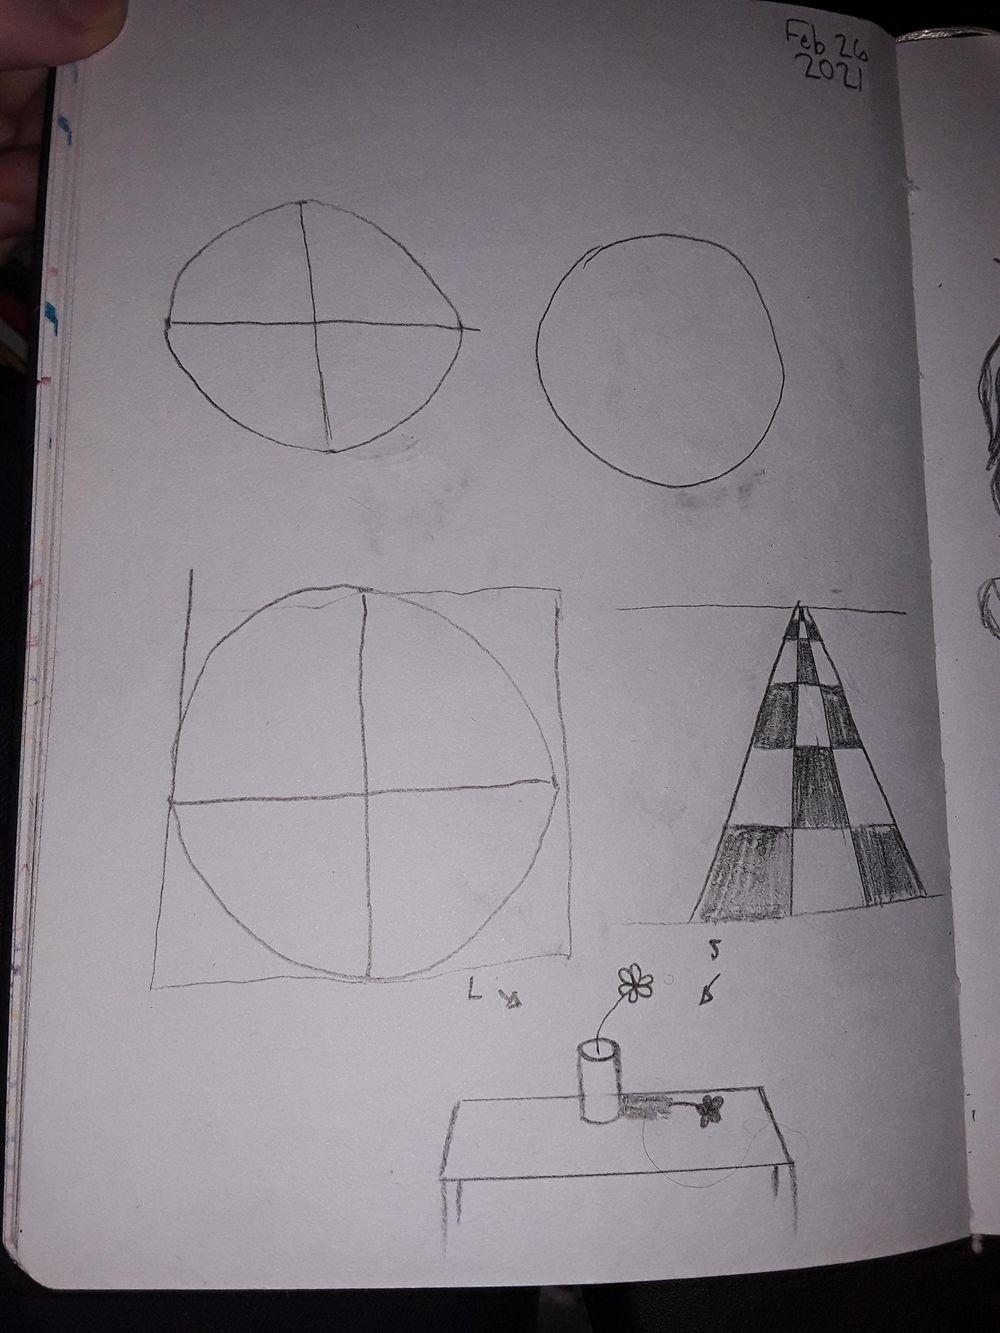 pencil drawing- basics - image 2 - student project